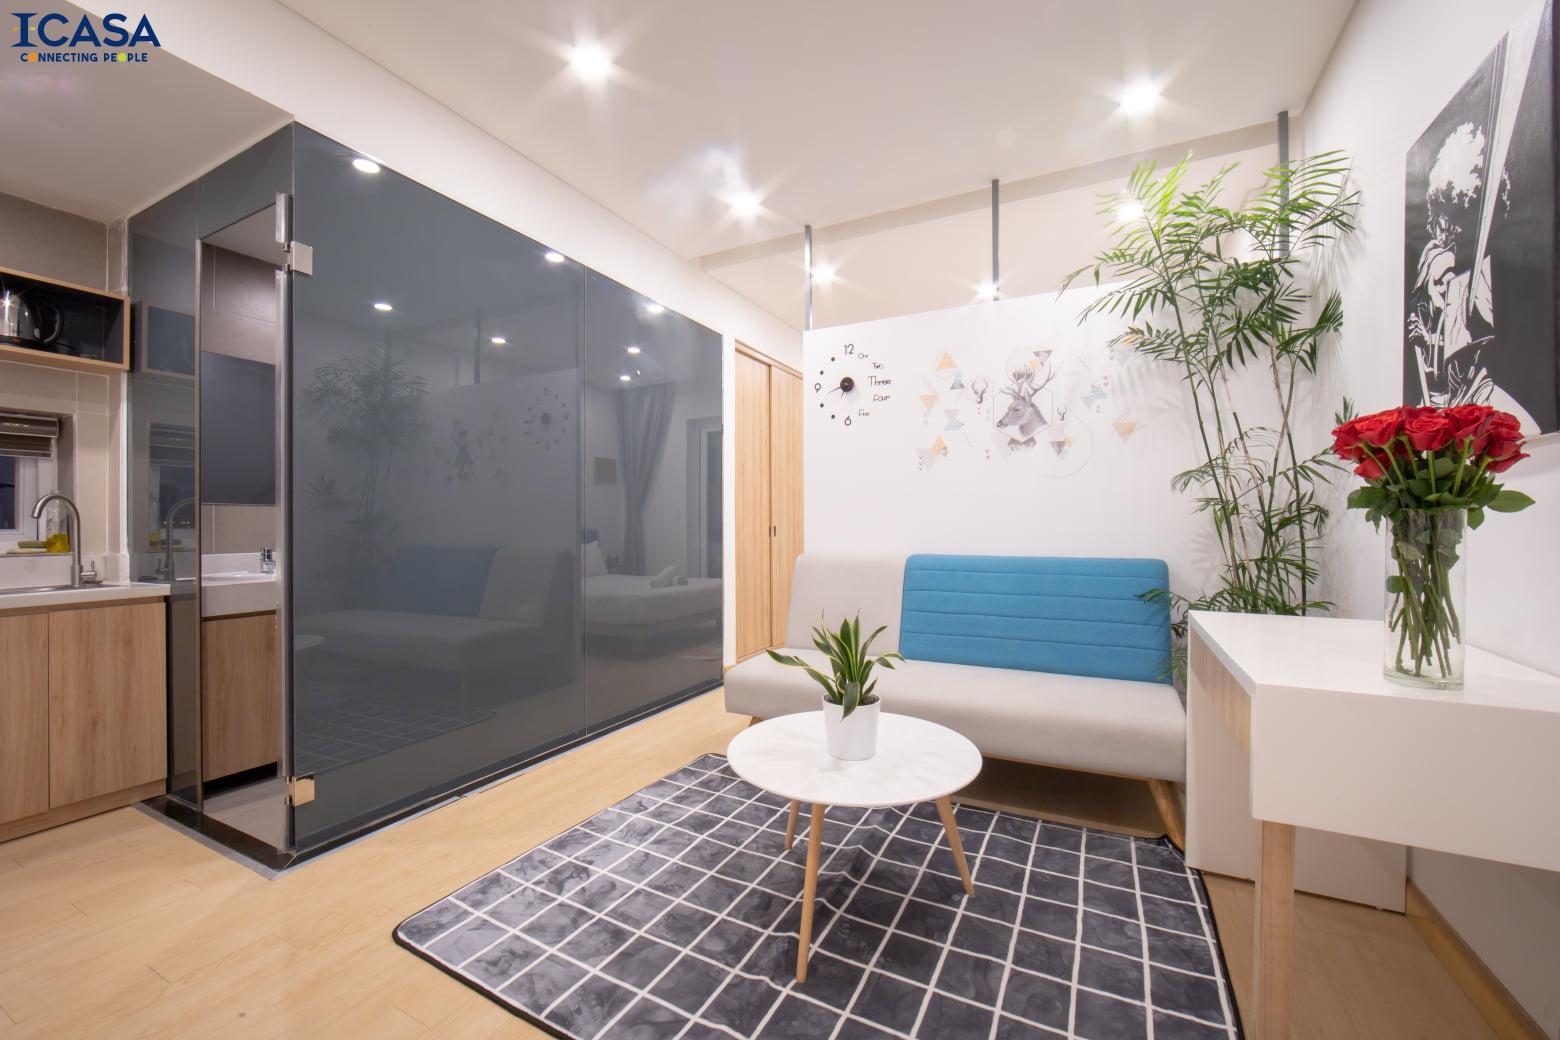 icasa serviced apartment hcm-